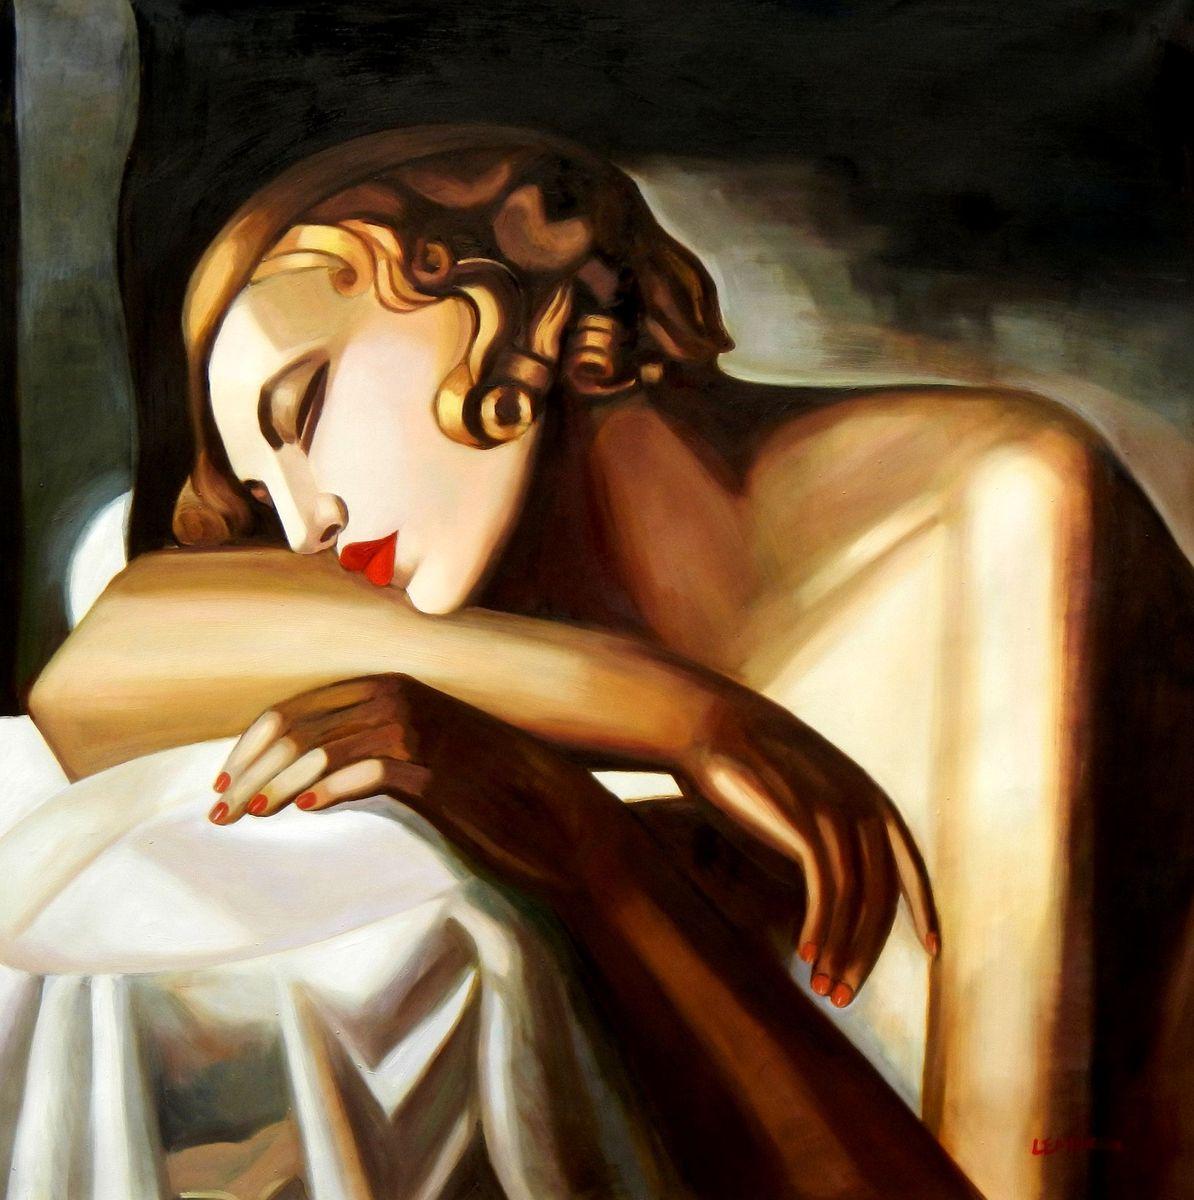 Homage of Tamara de Lempicka - Die Schläferin II m96919 120x120cm Art Deco Ölbild handgemalt